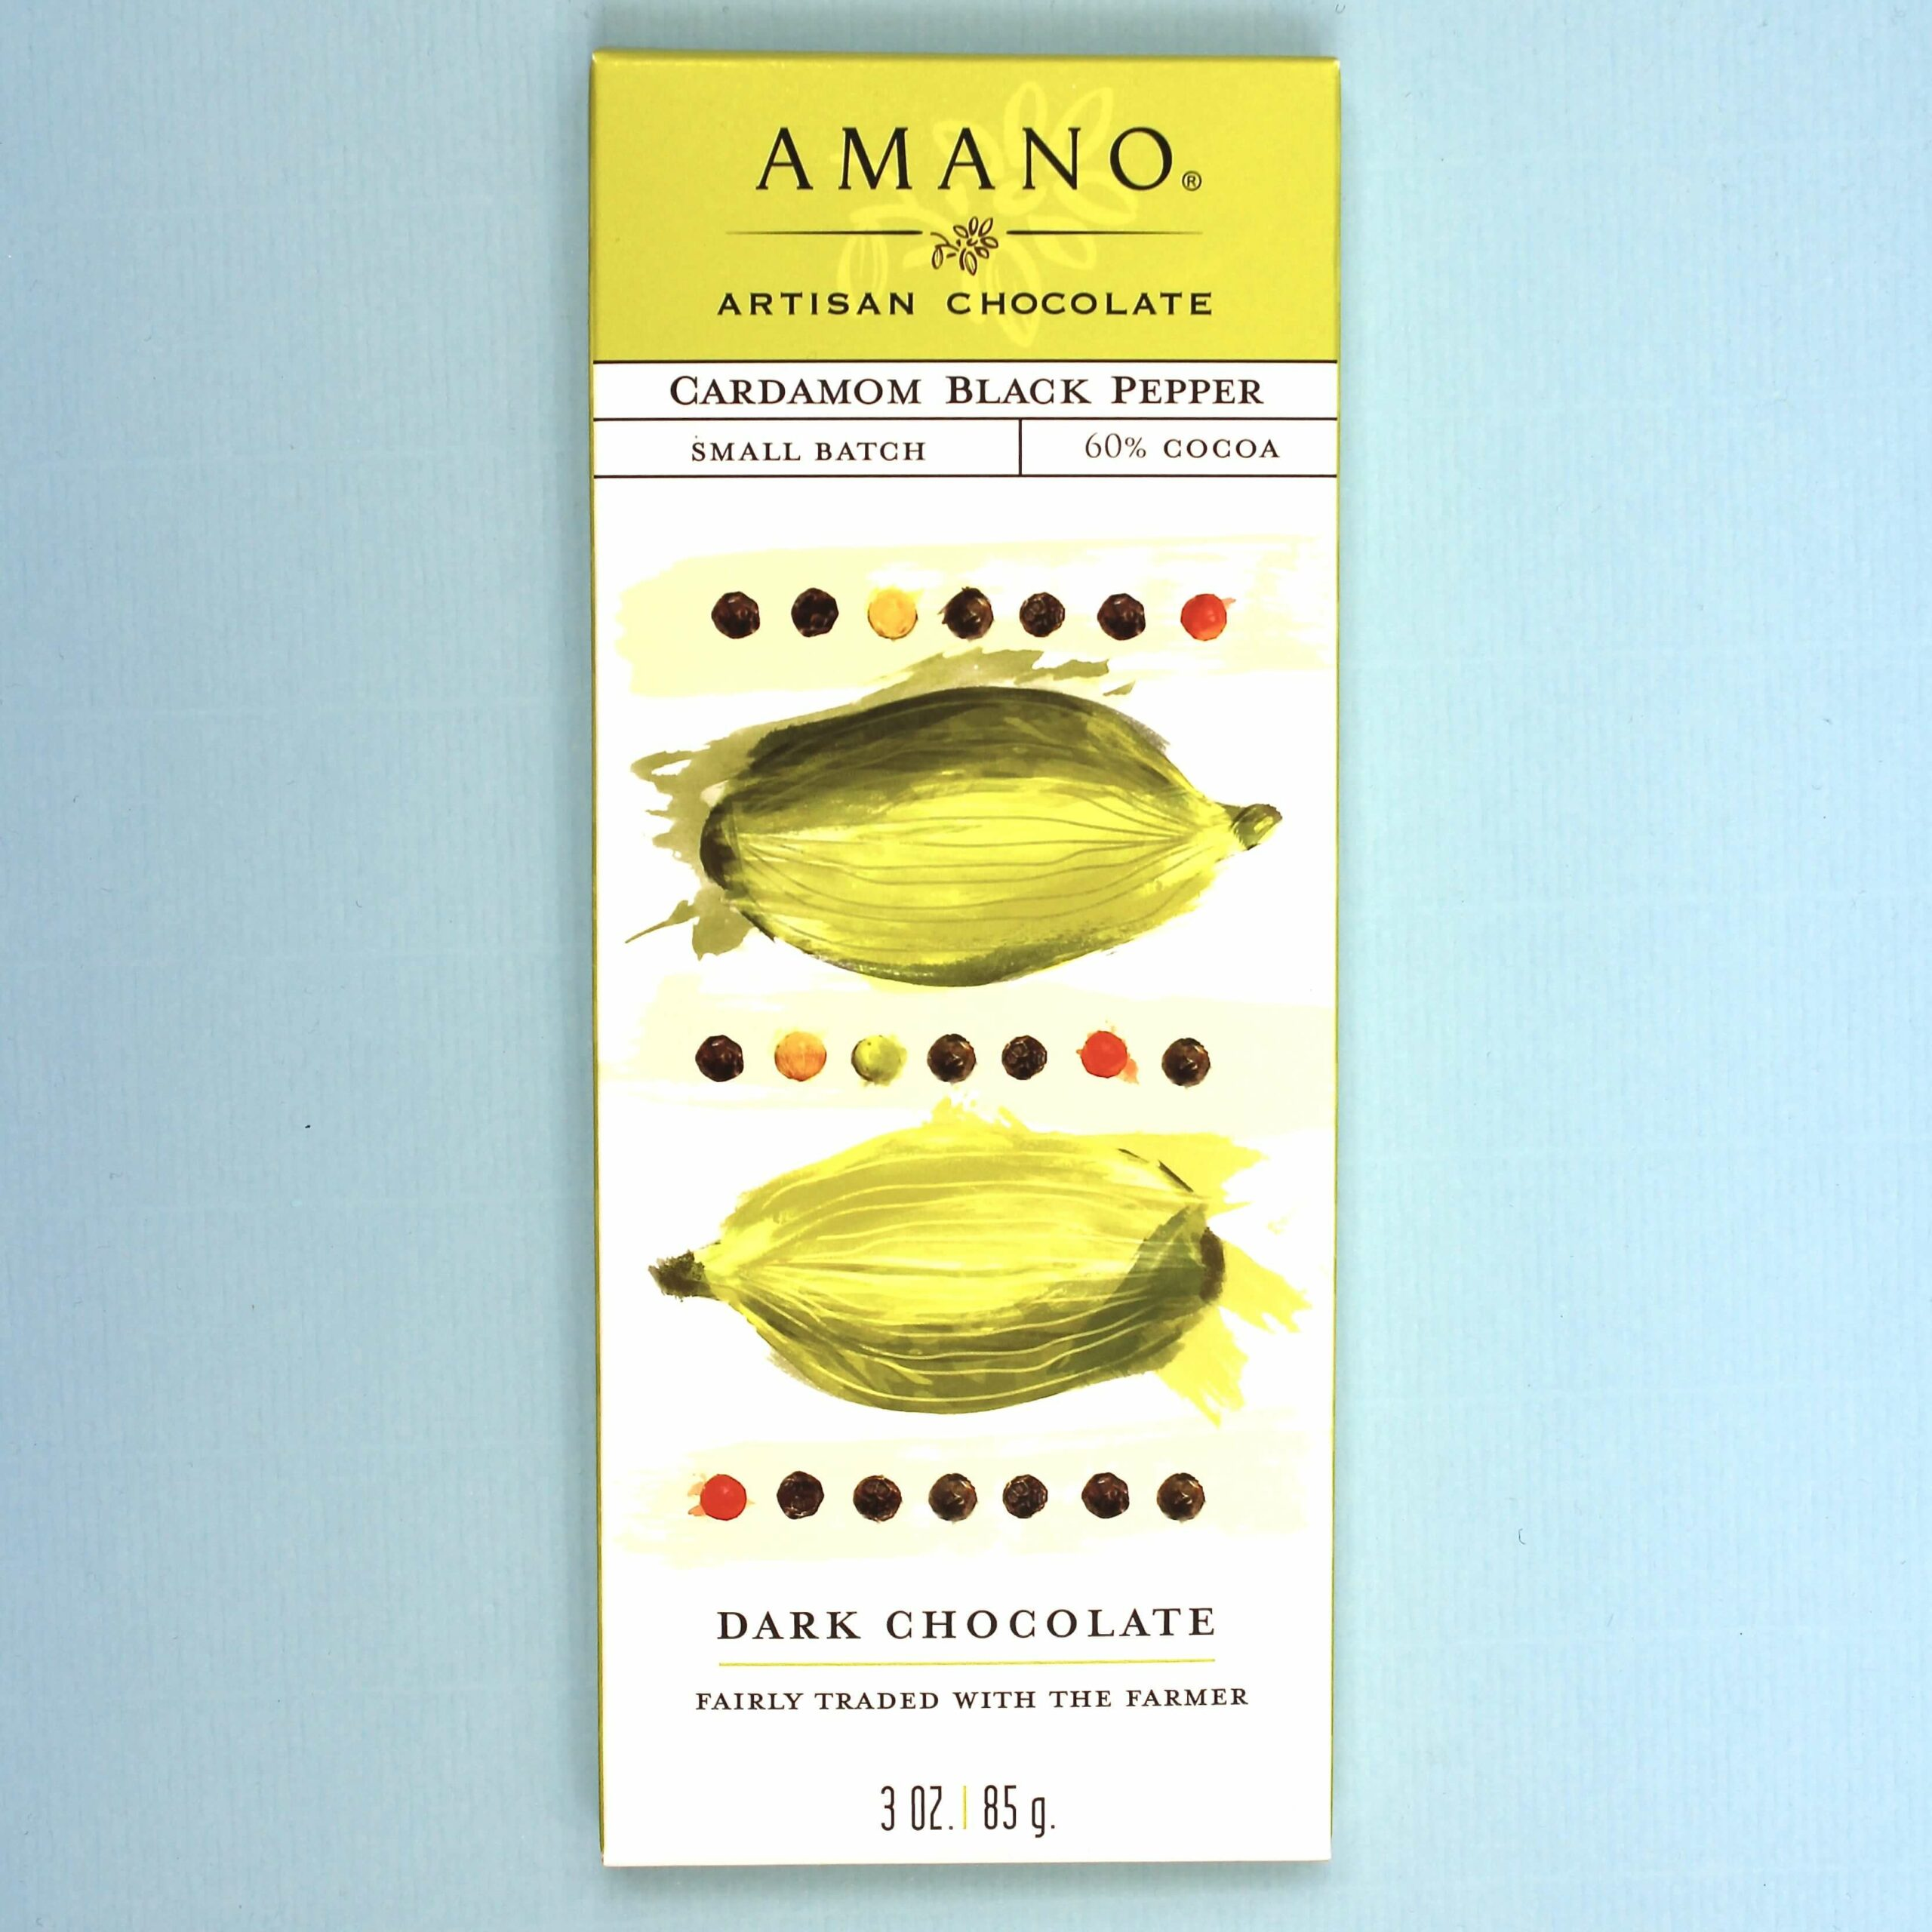 amano artisan chocolate cardemom black pepper 60